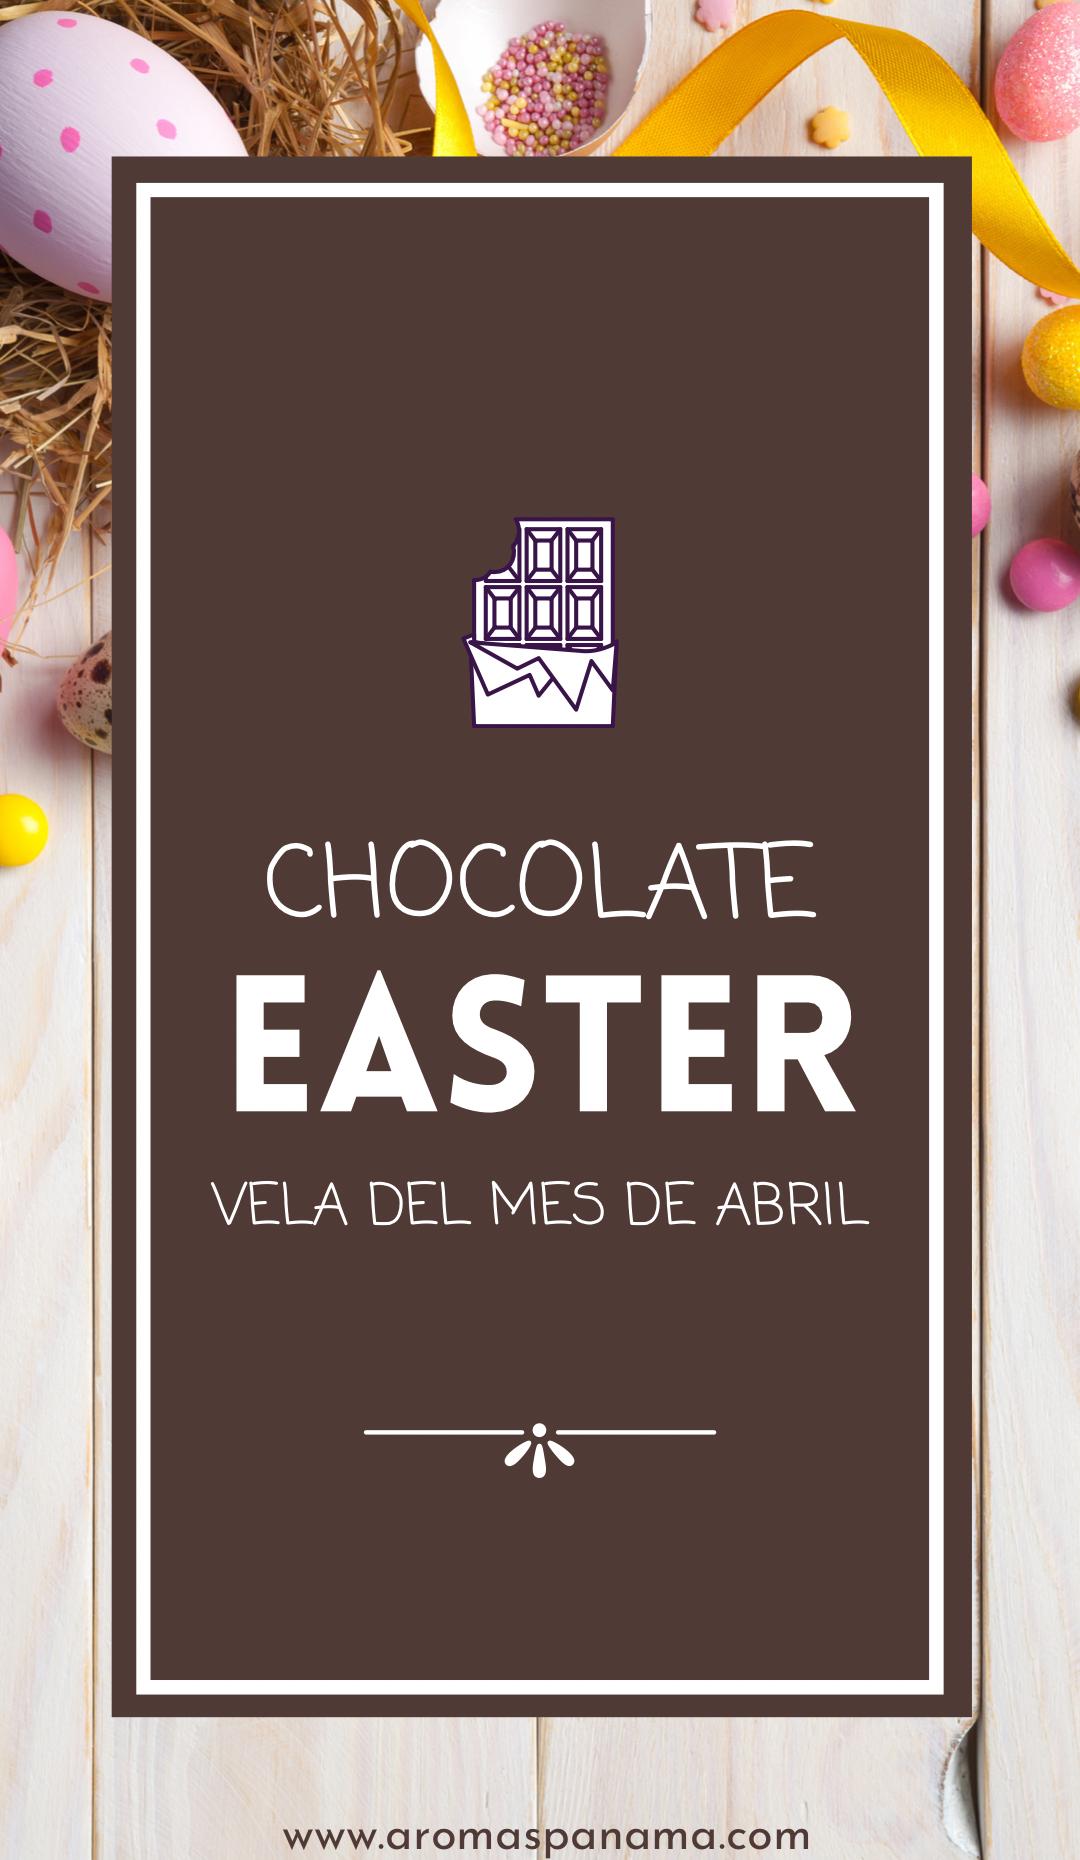 Vela del Mes, Chocolate